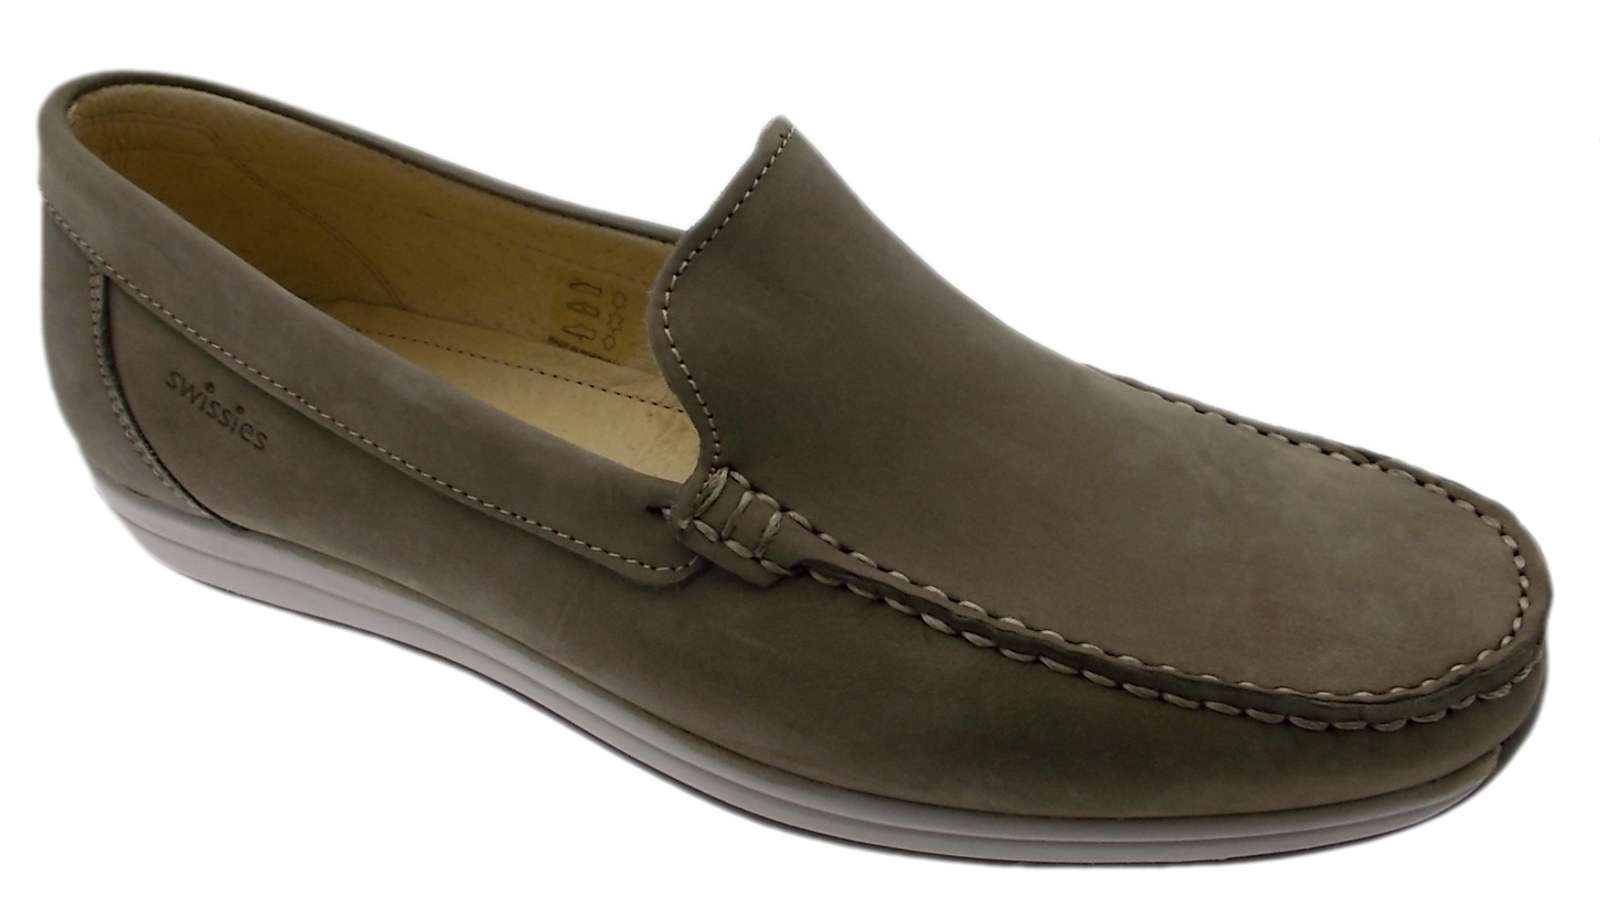 Grijs nubuck loafer klassieke kunst MURRAY Swissies